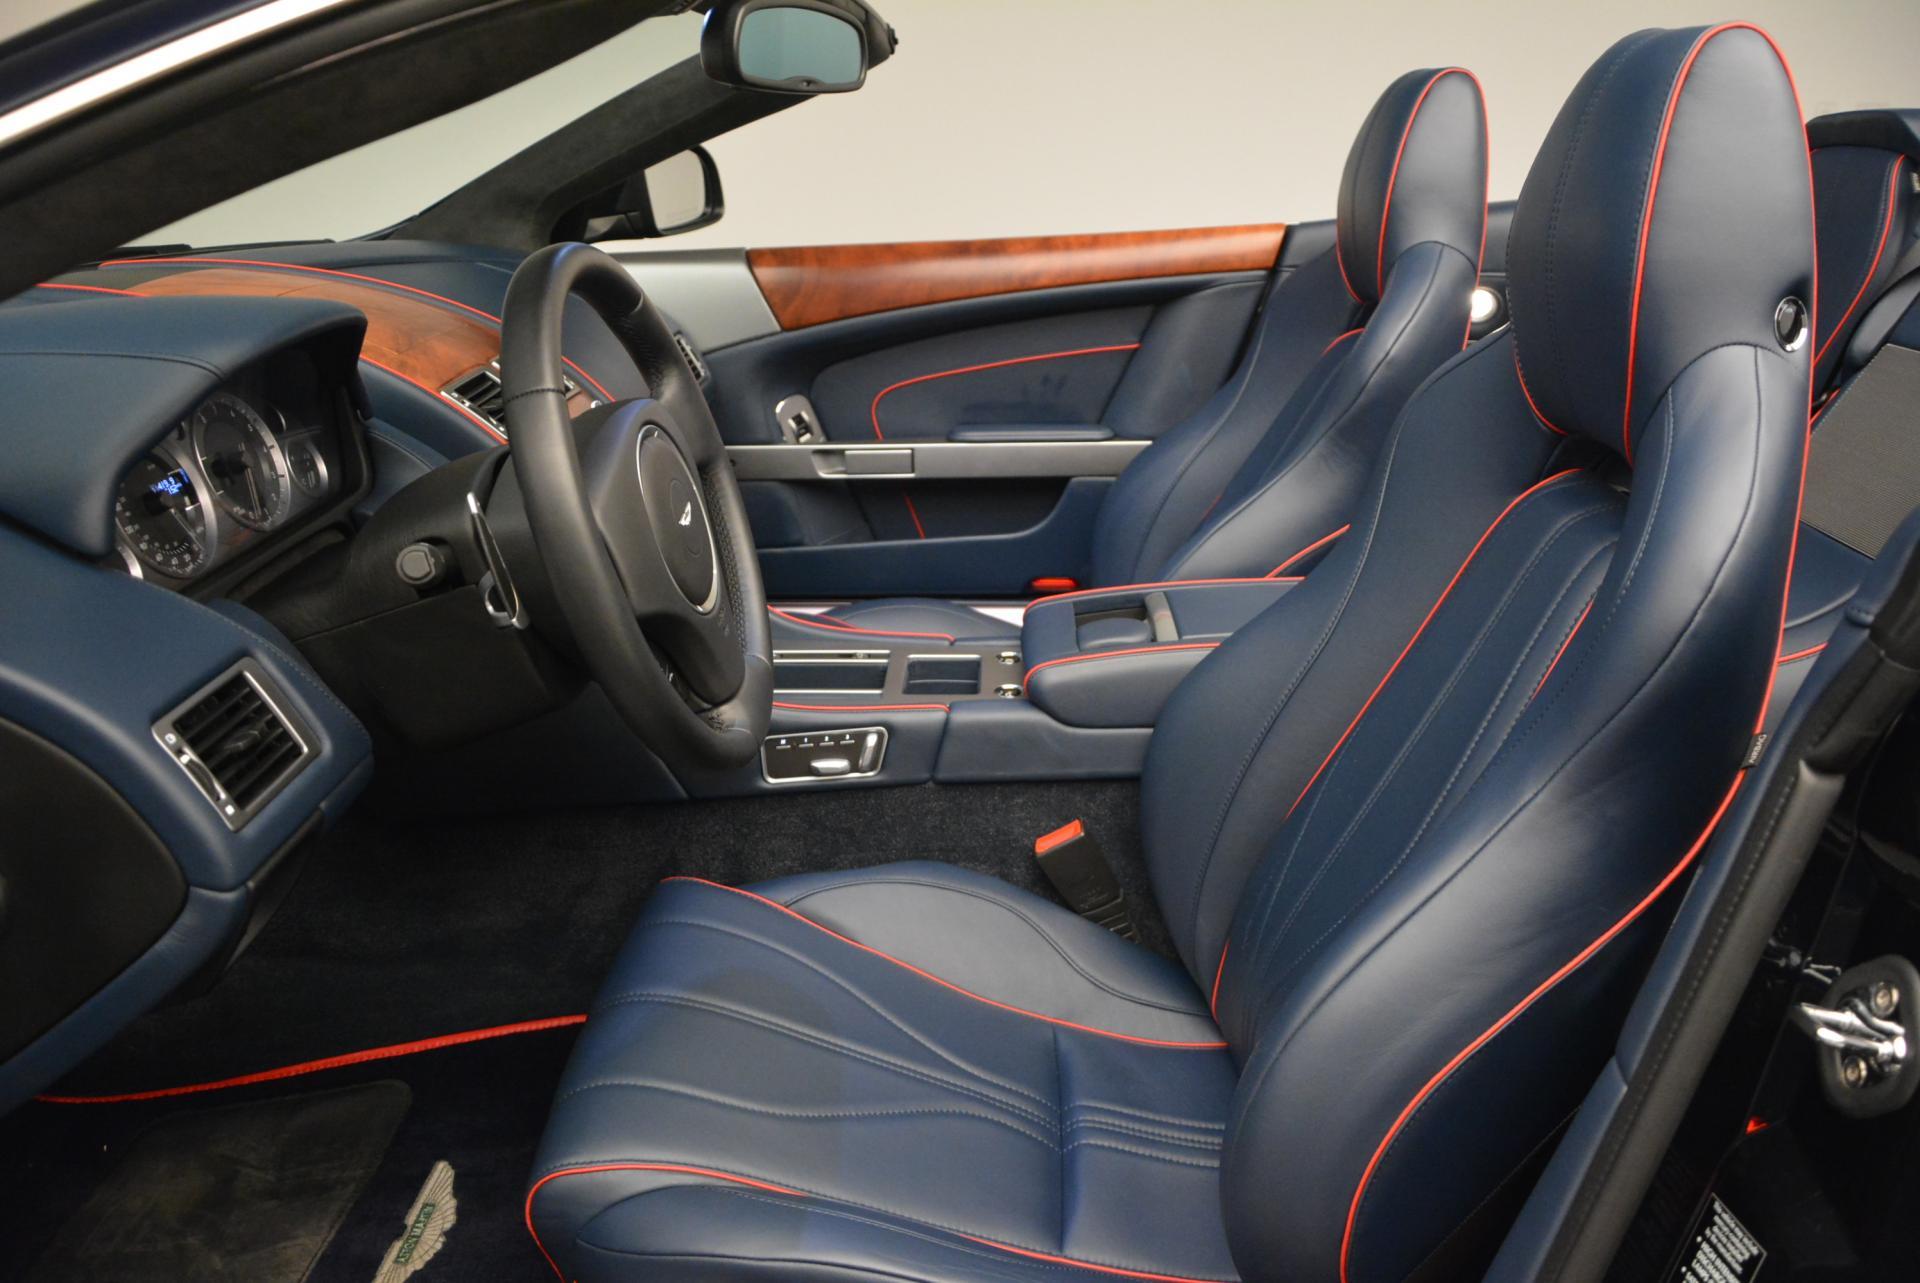 Used 2014 Aston Martin DB9 Volante For Sale In Westport, CT 519_p13